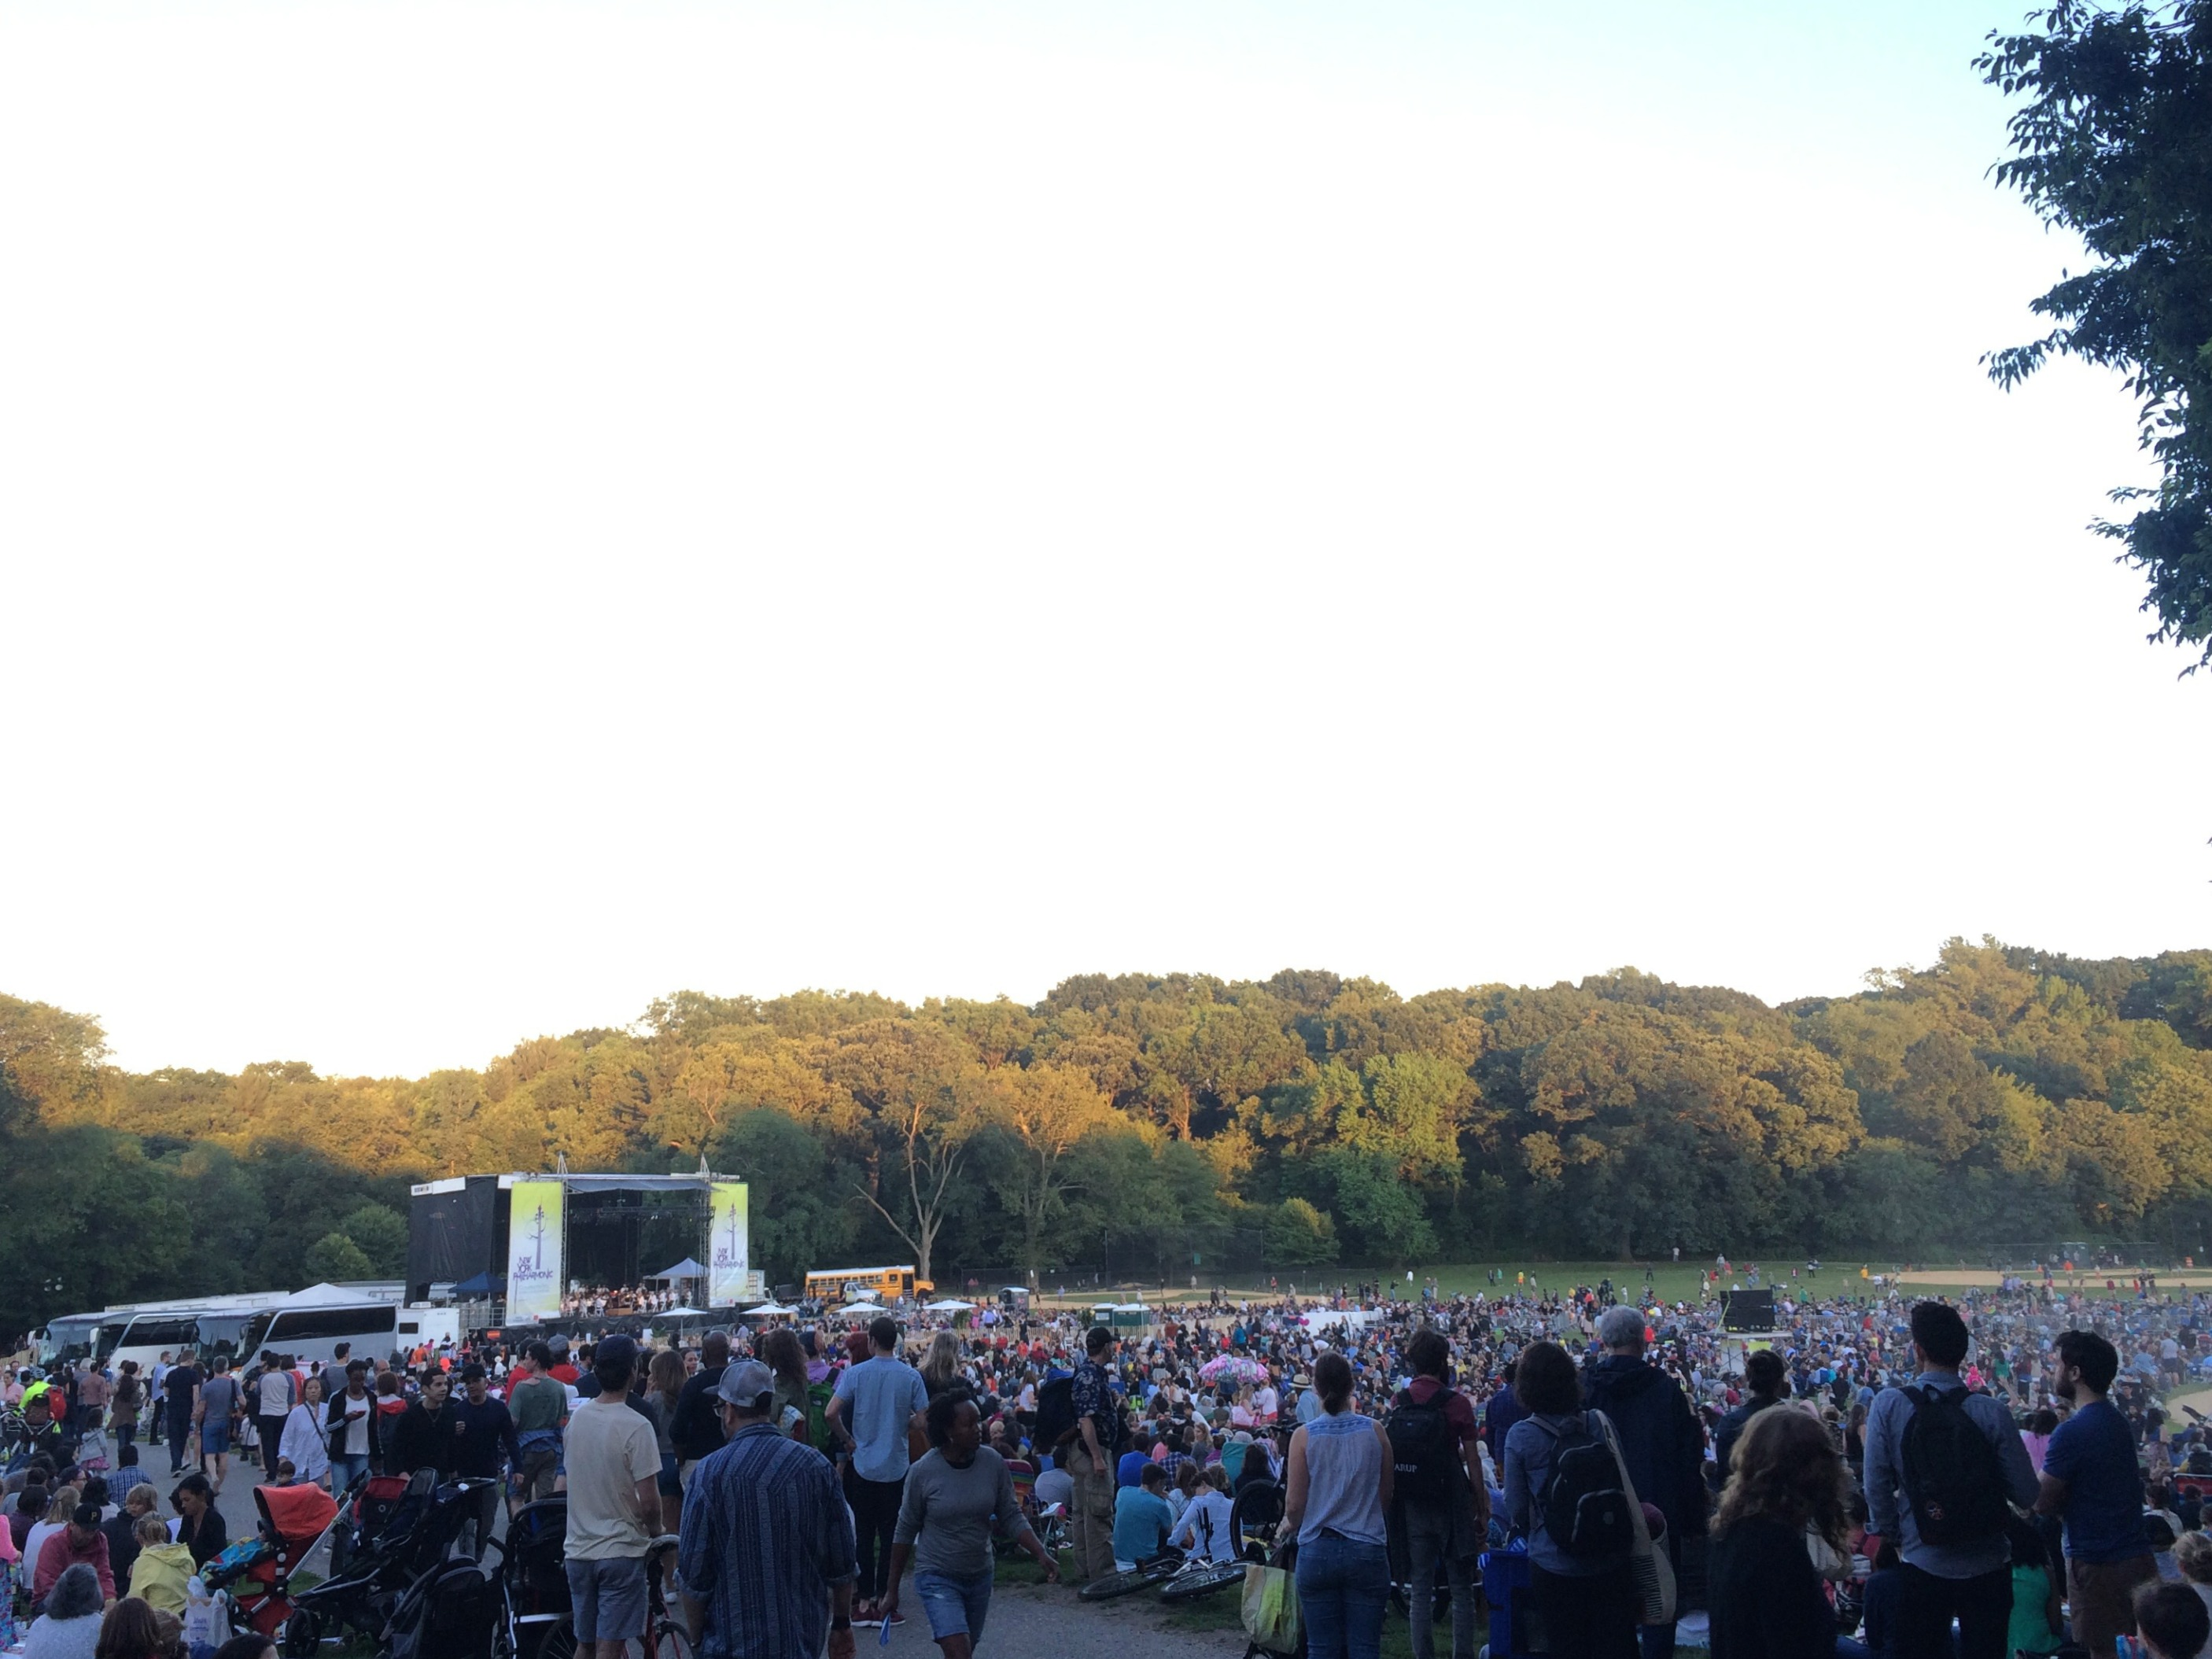 brooklyn phillharmonic orchestra prospect park